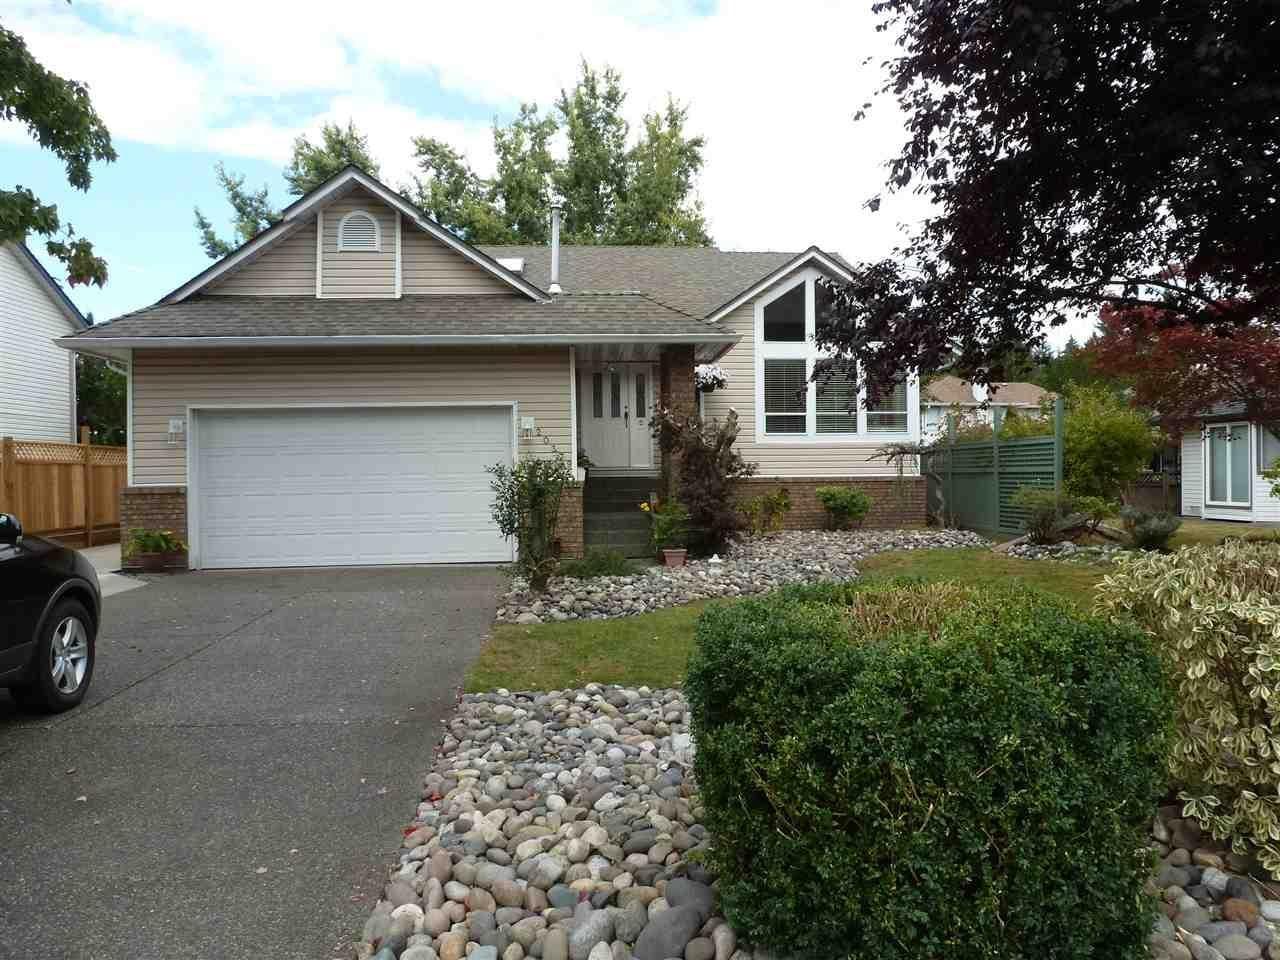 R2103679 - 20379 91B AVENUE, Walnut Grove, Langley, BC - House/Single Family